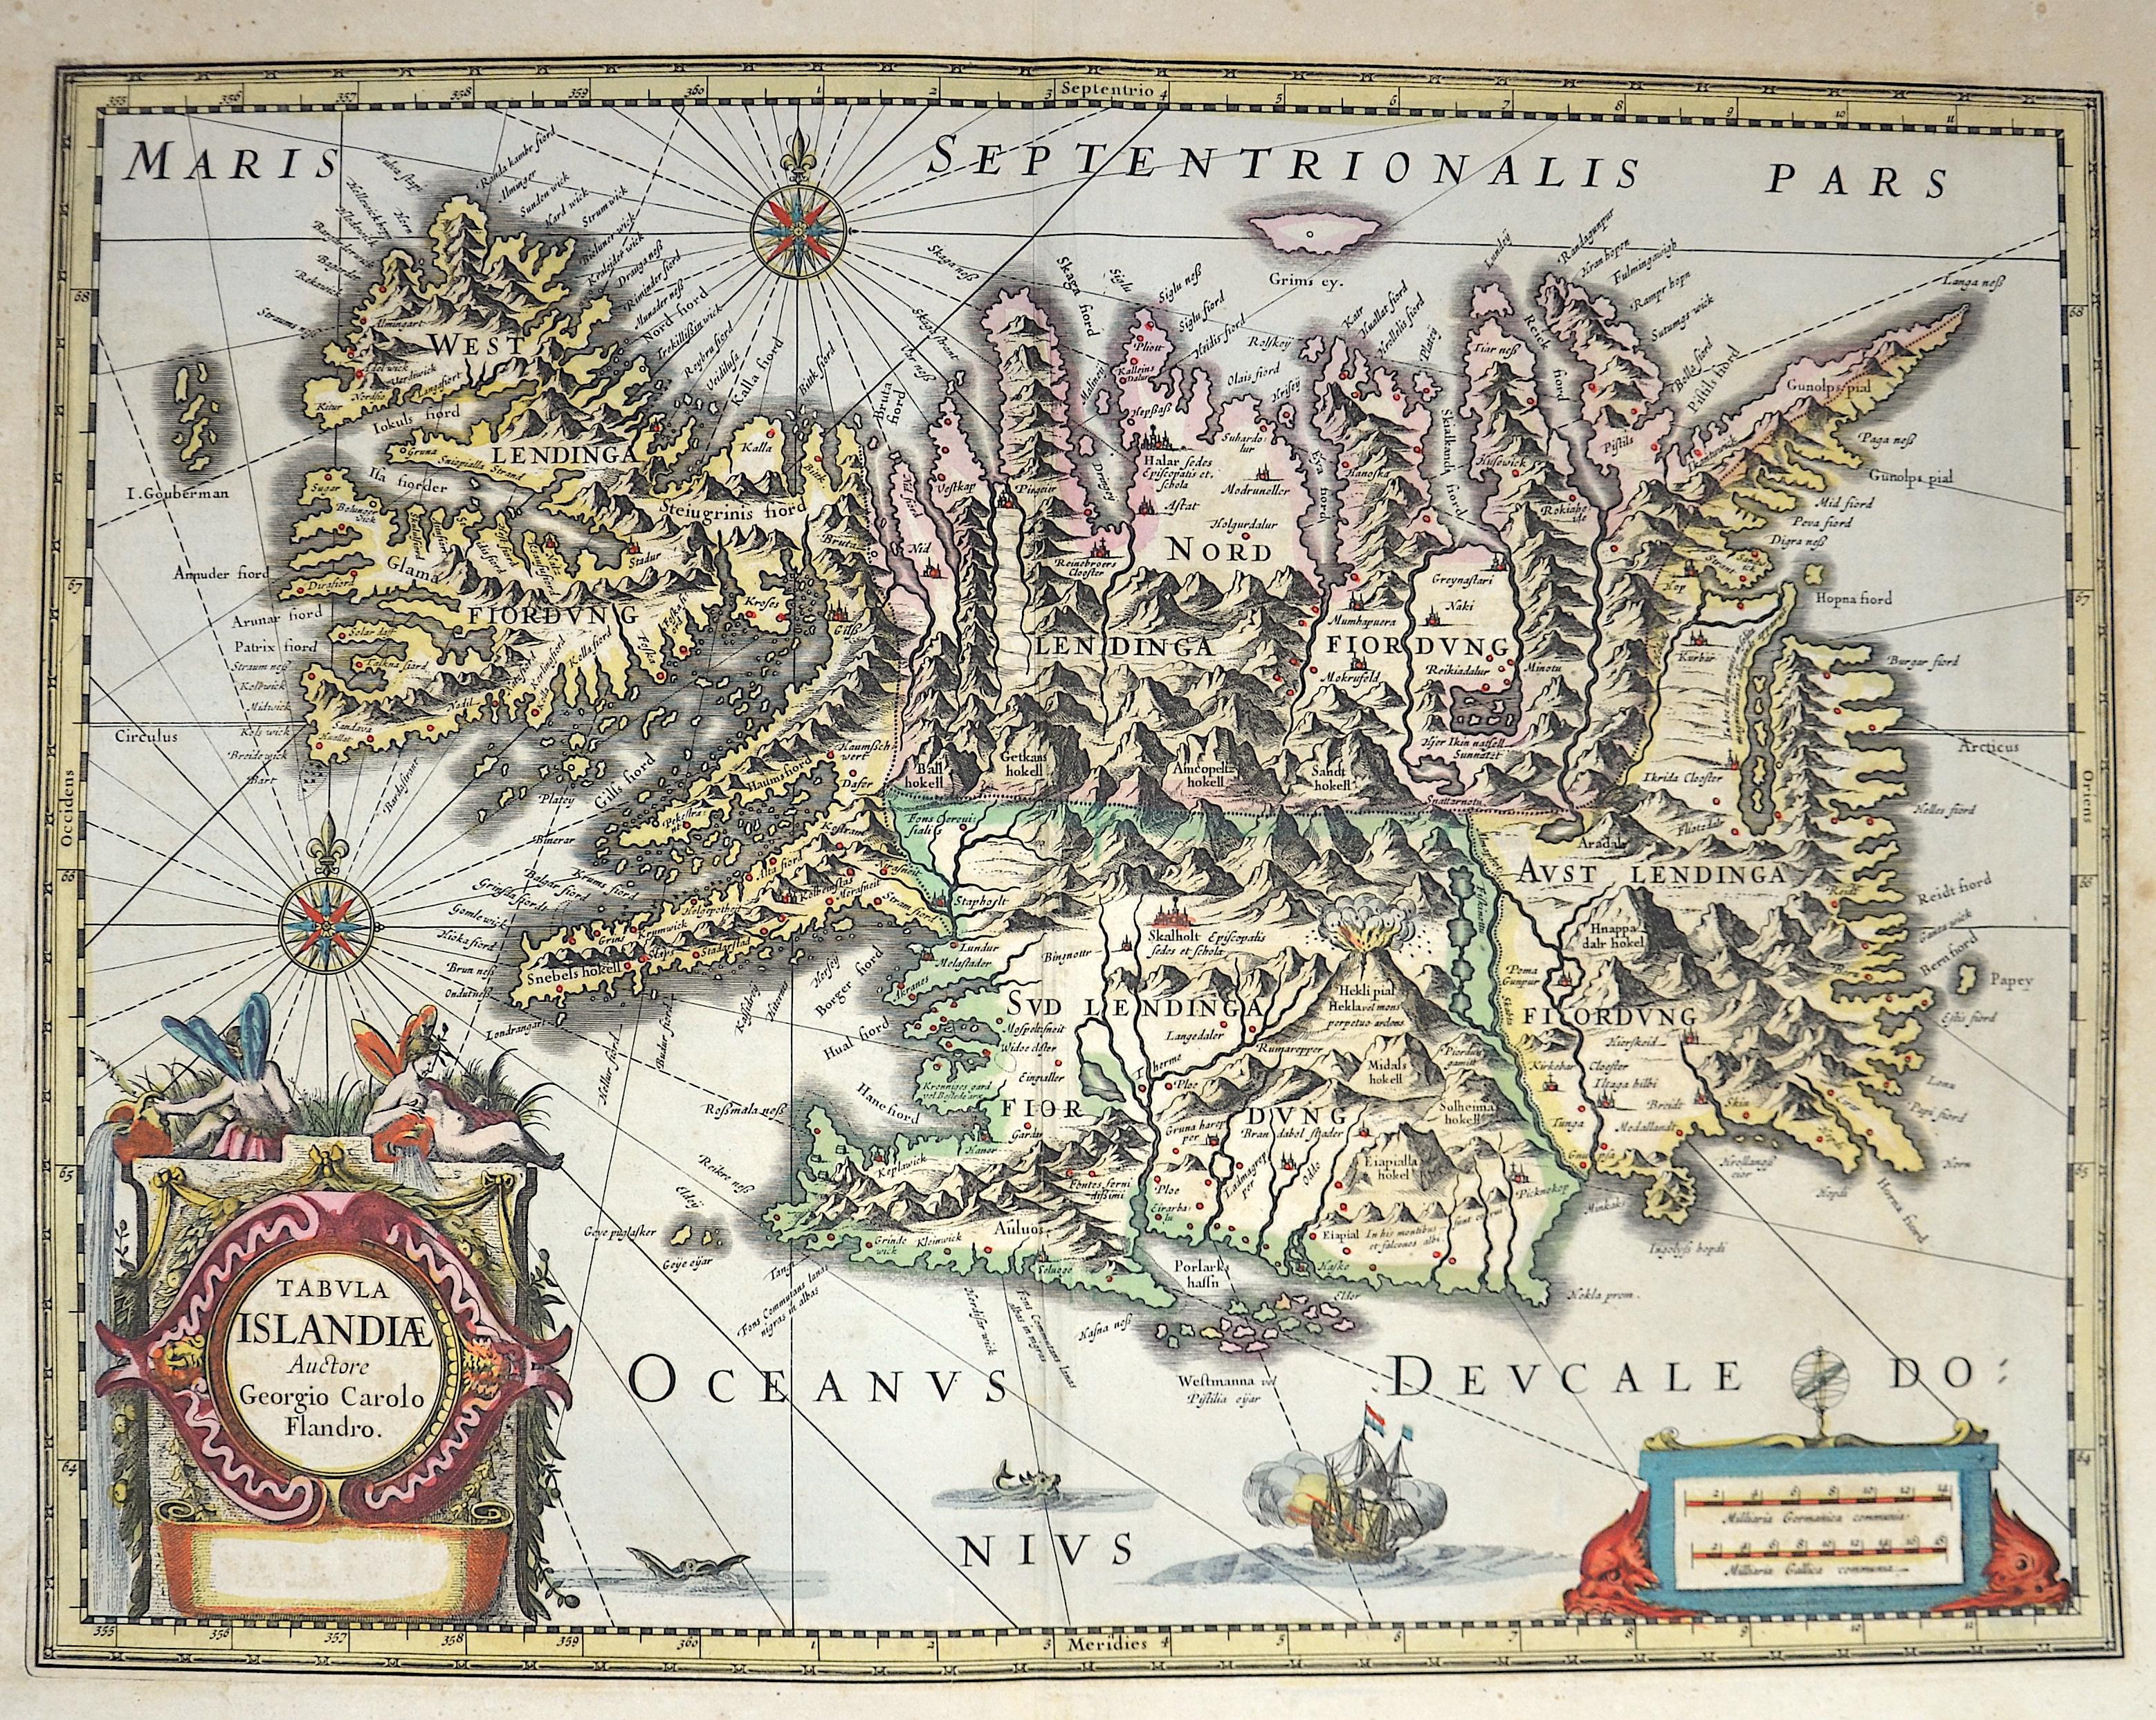 Blaeu Willem Janszoon Tabula Islandiae Auctore Georgio Carolo Flandrol.